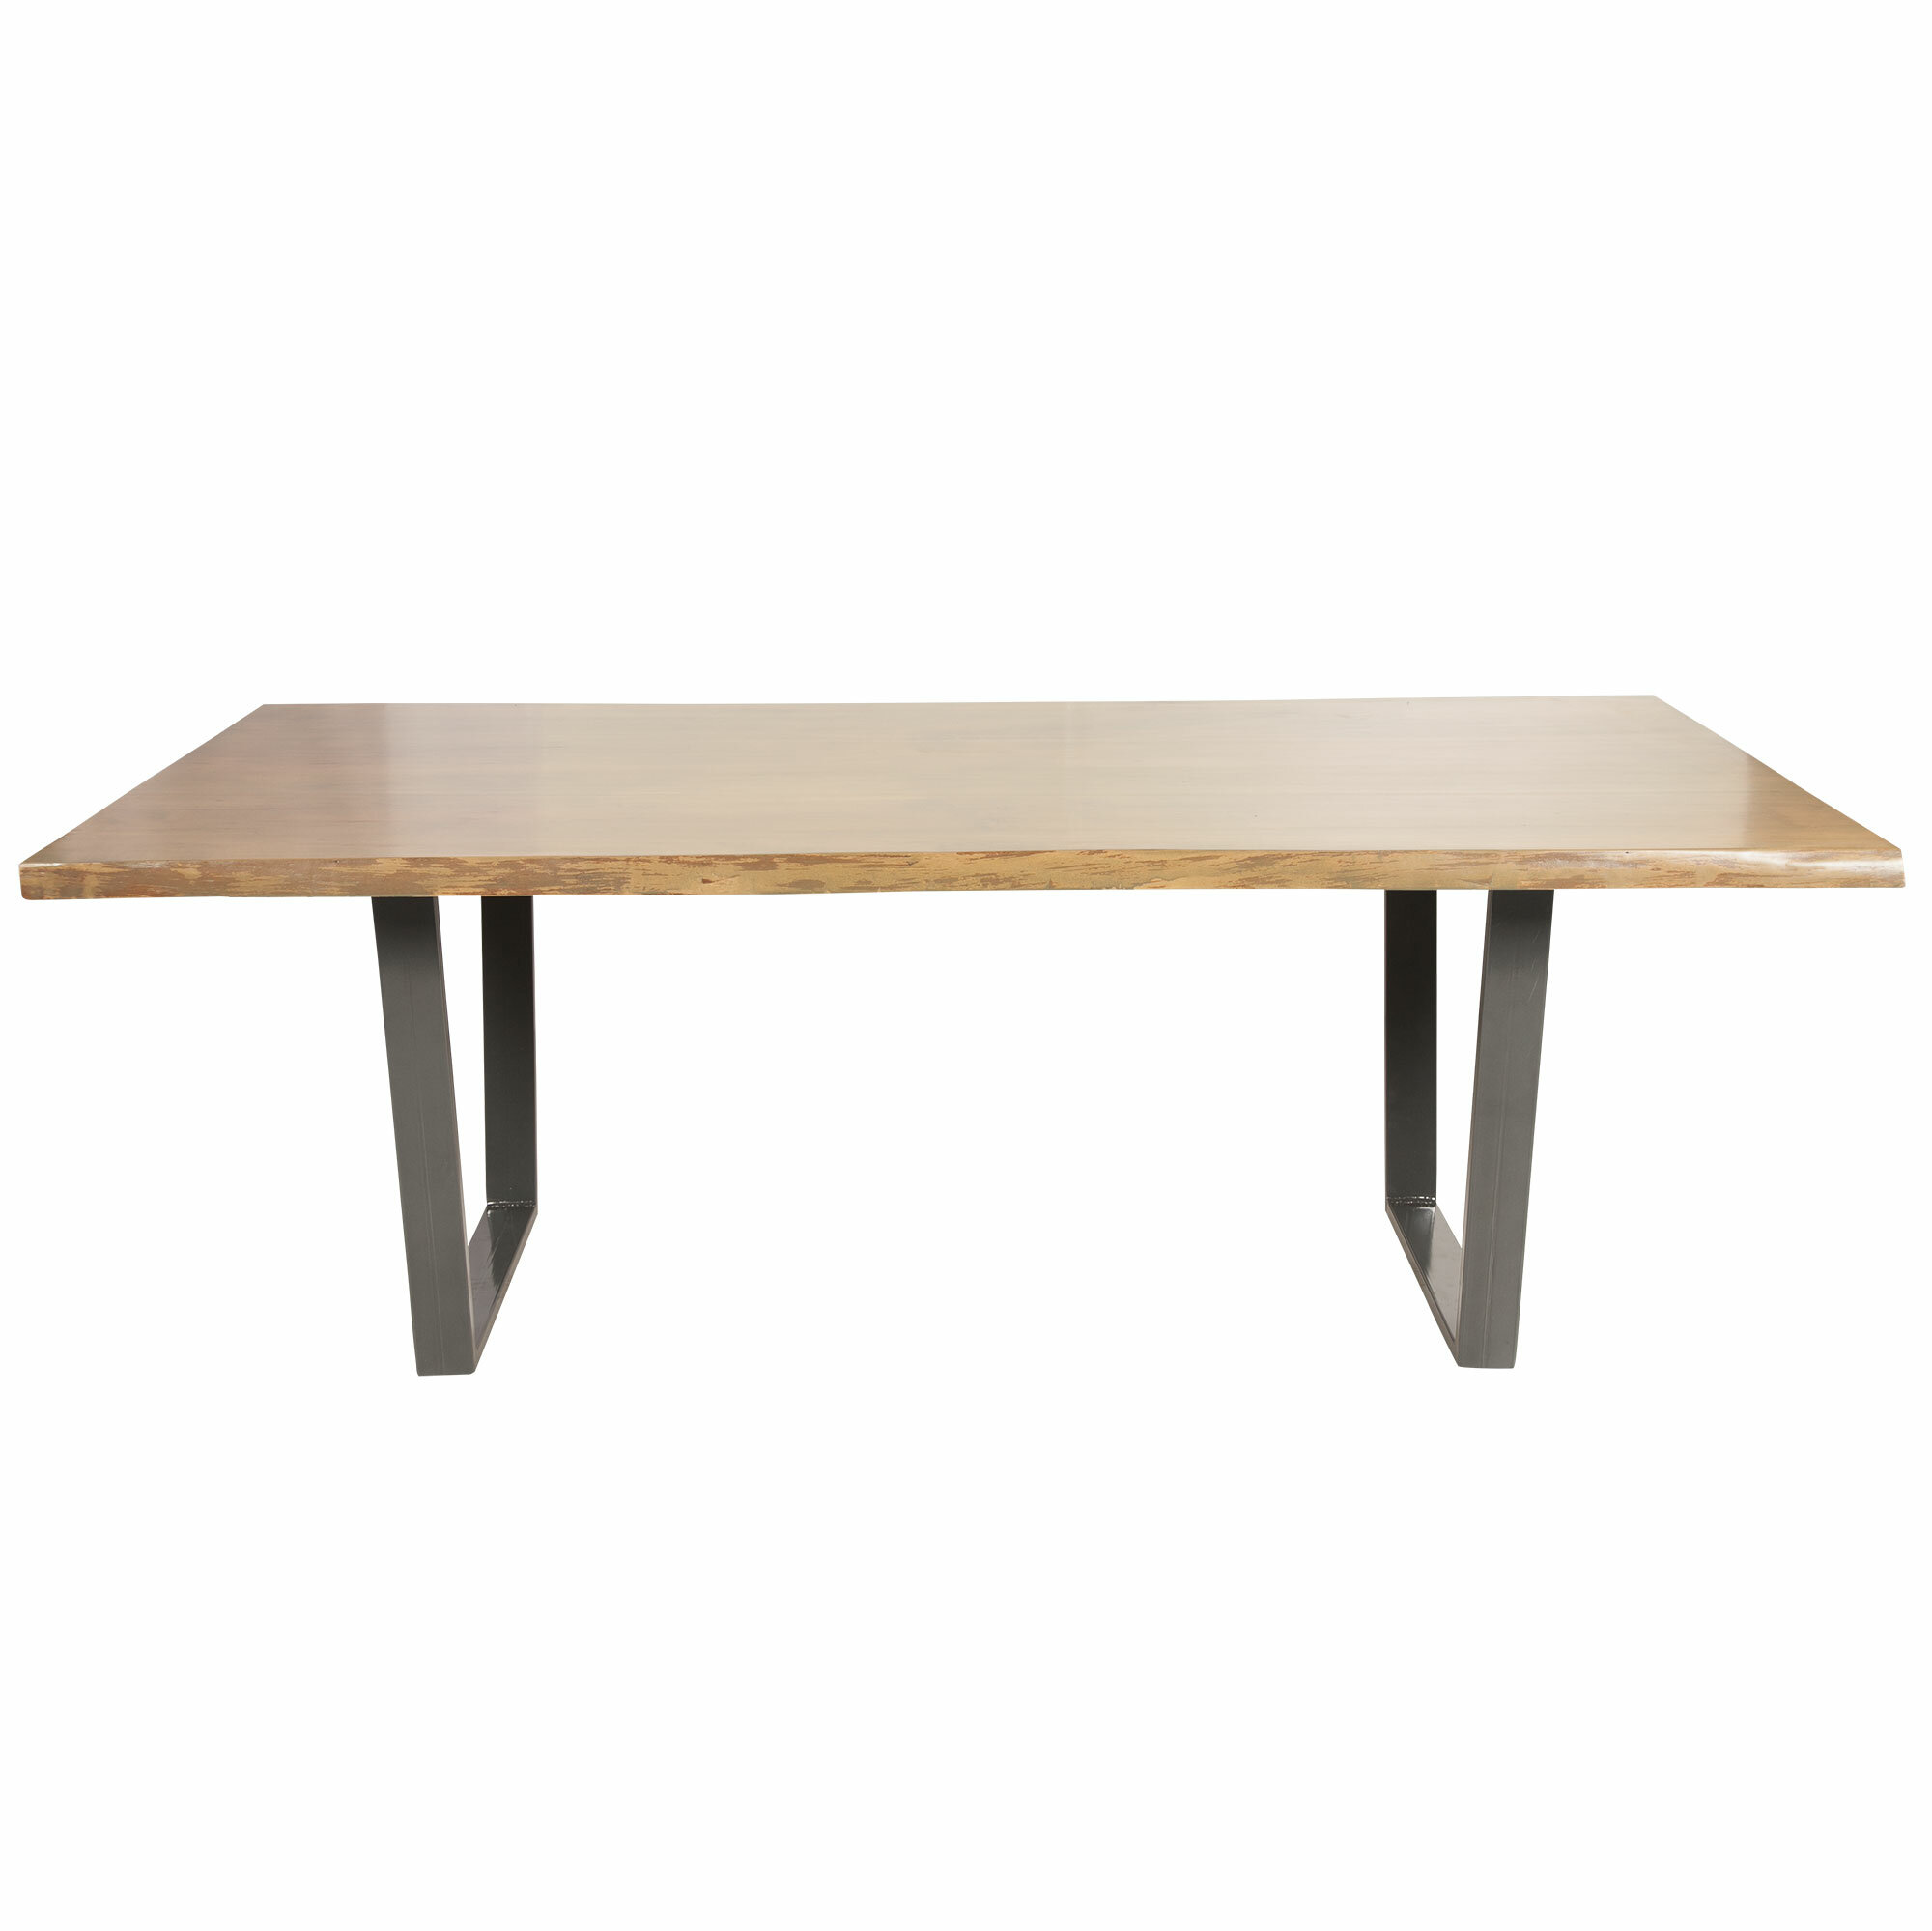 ontario live table antique edge design living img toronto sentient style with muskoka brass wishbone base walnut black wood york home new canada dining